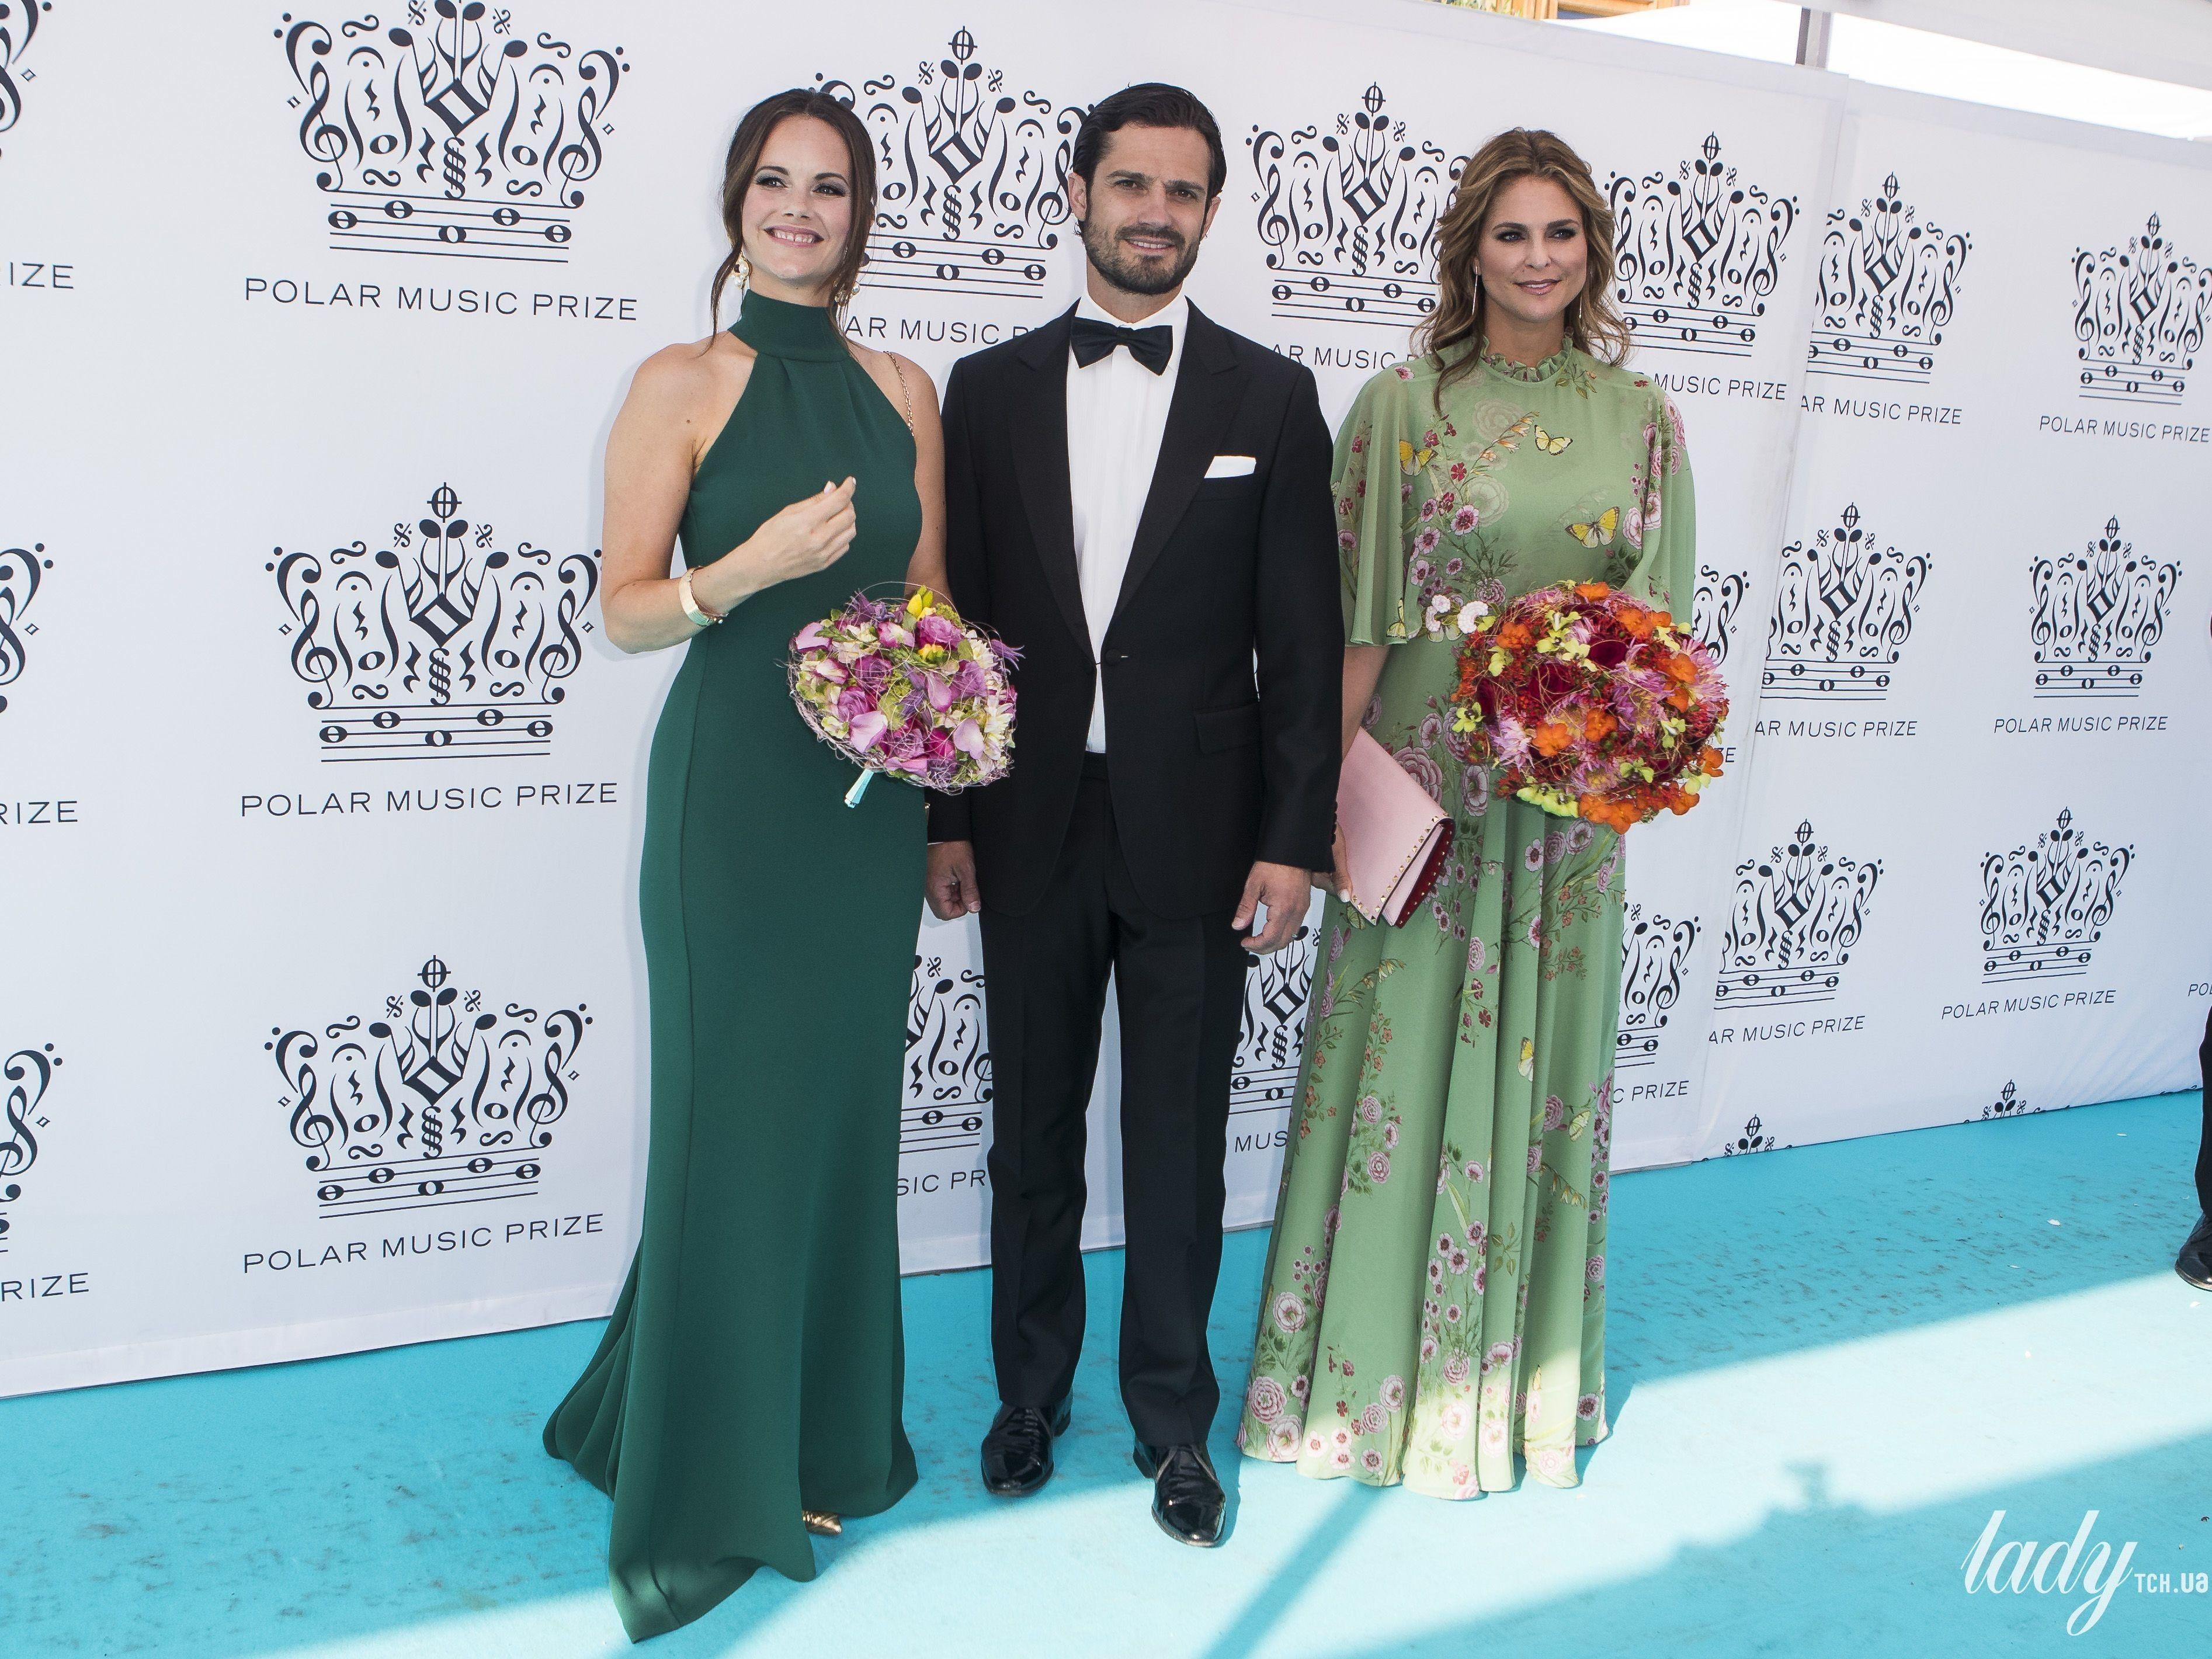 Принцесса София, принц Карл Филипп и принцесса Мадлен l